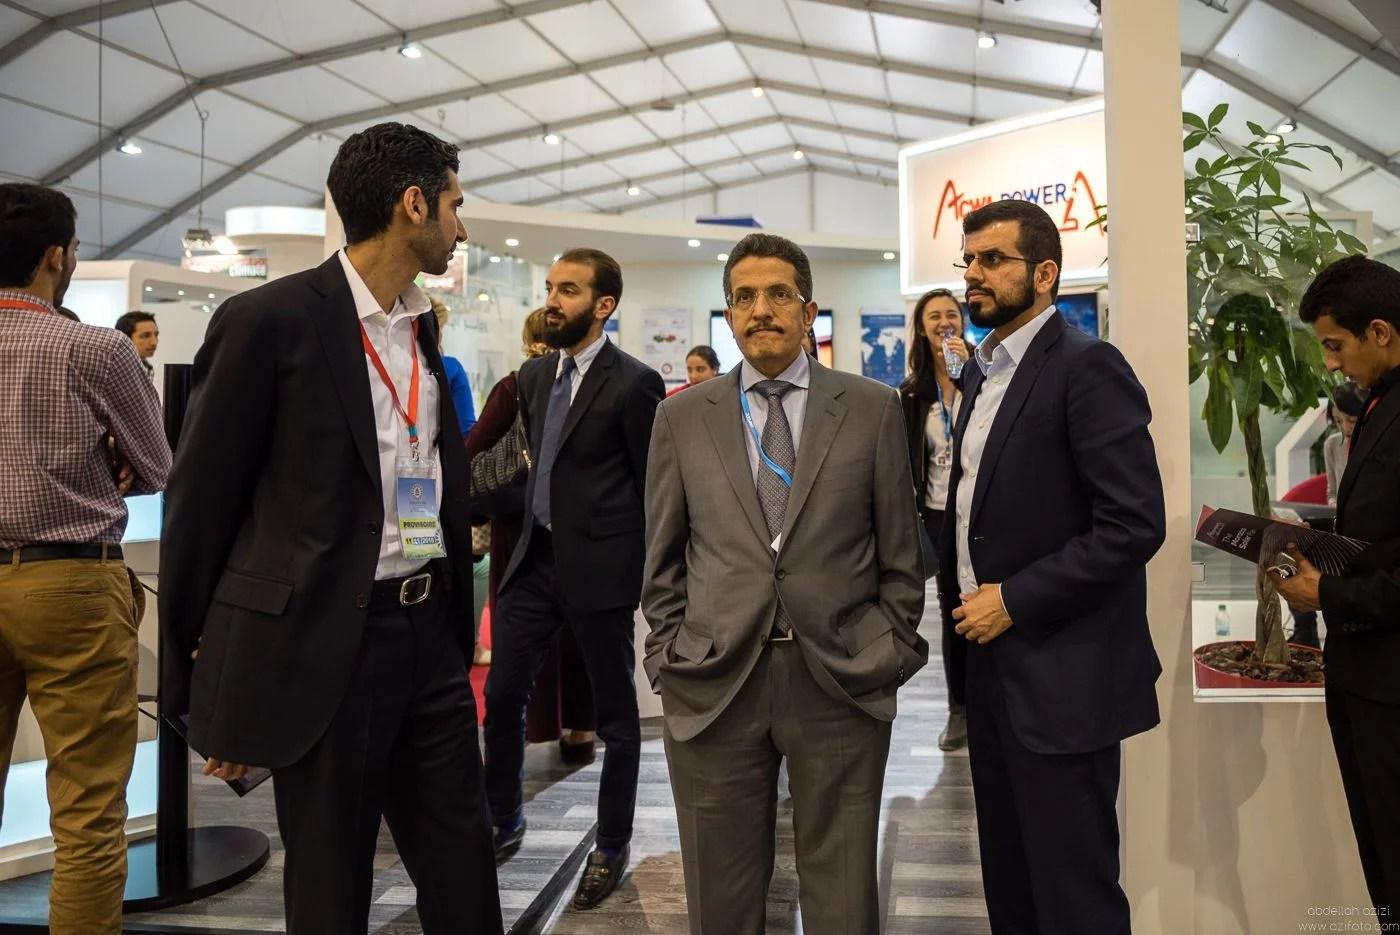 Mohammad Abunayyan is Chairman of Abunayyan Holding and ACWA Power International at COP22